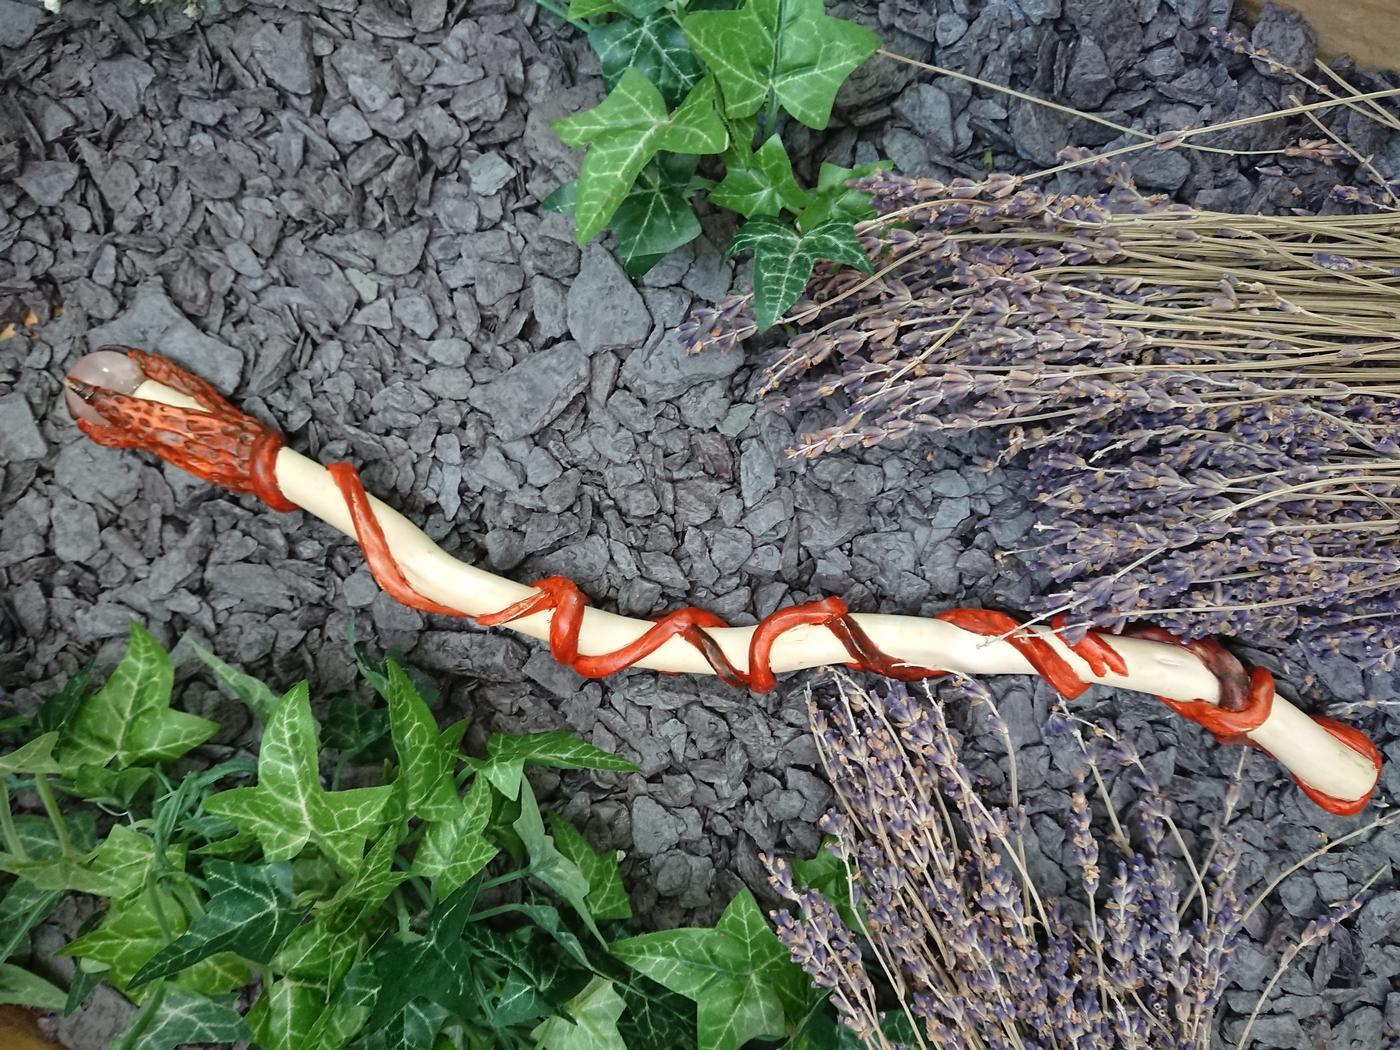 Rose Quartz Dragon's Claw Wand